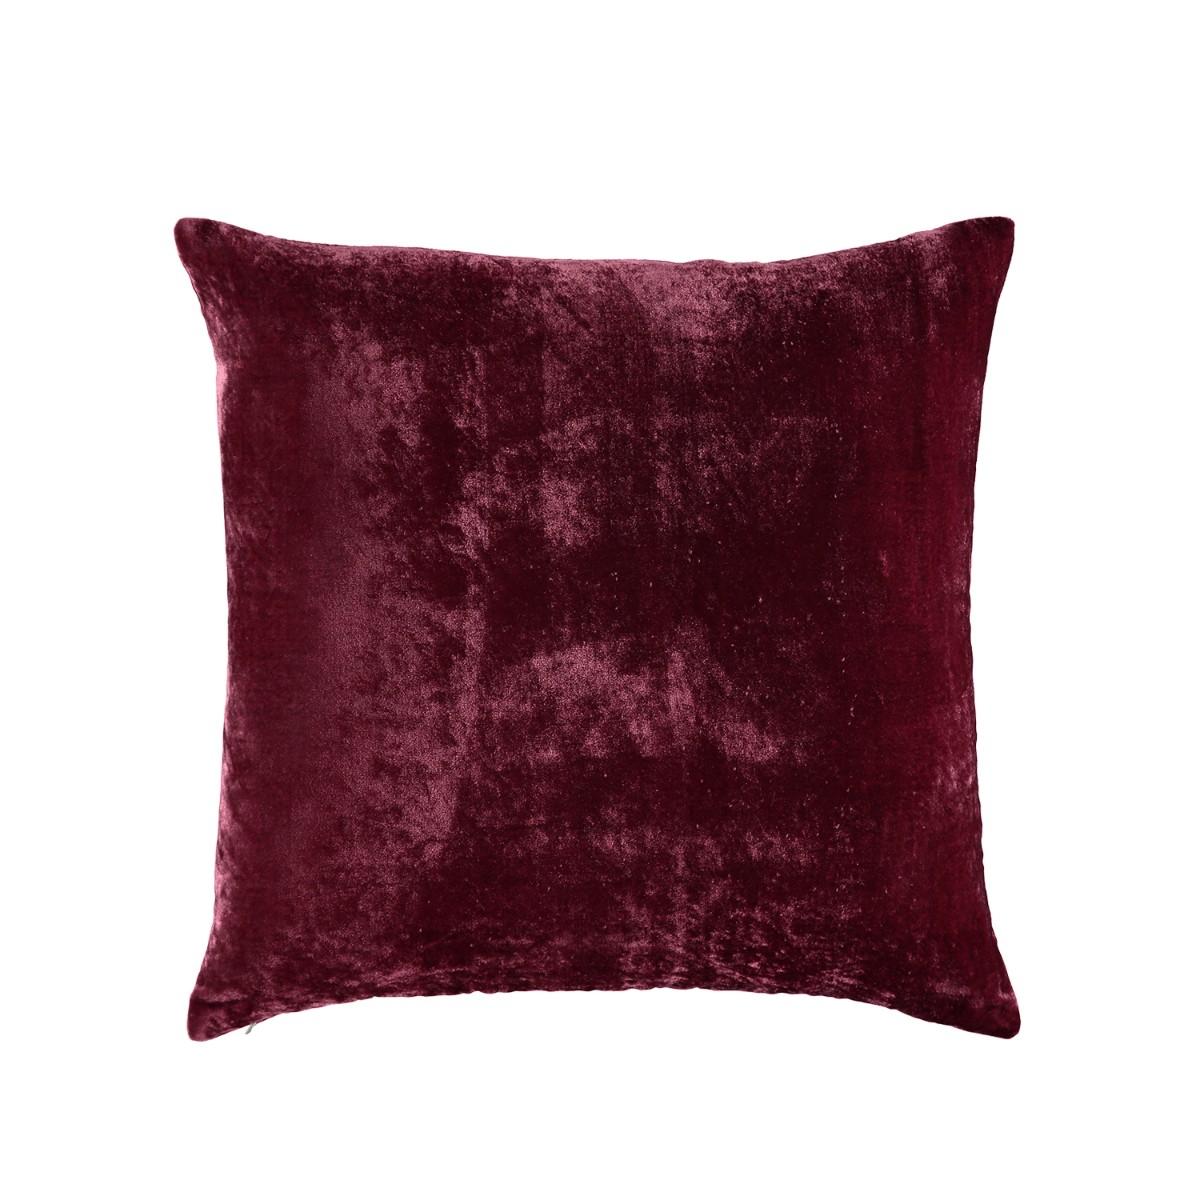 William Yeoward  Paddy Velvet Cushion Plum